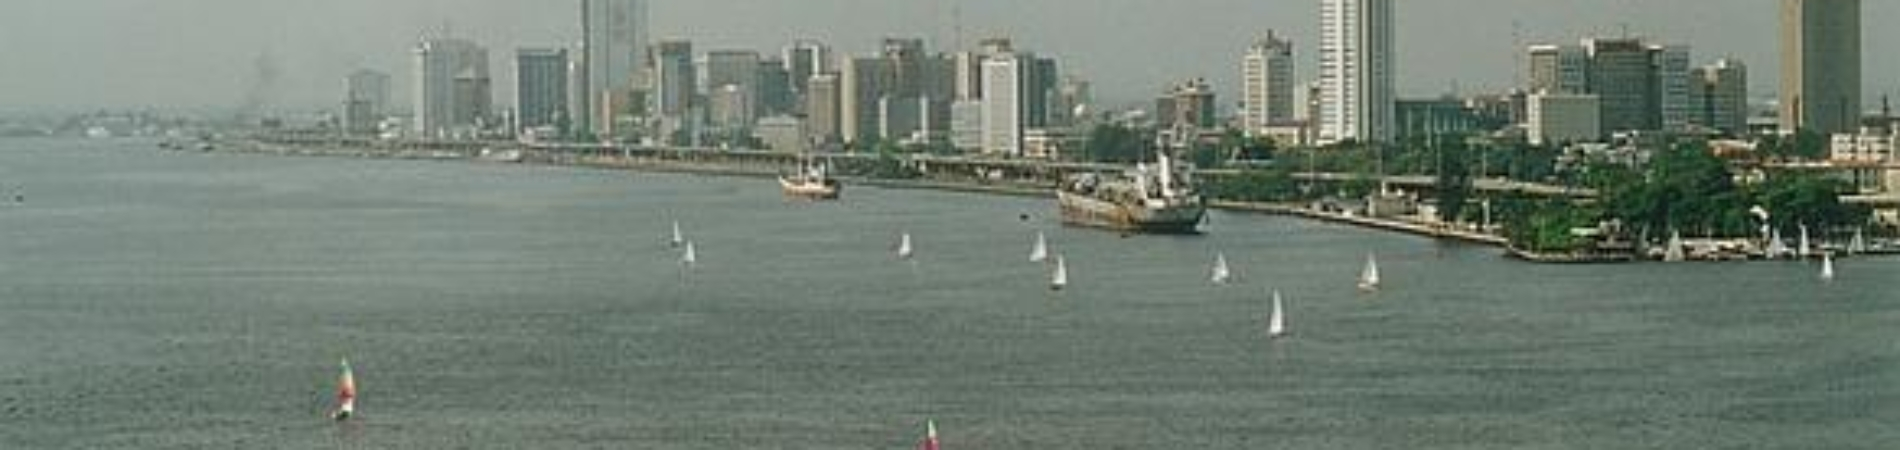 Lagos Bay, Nigeria